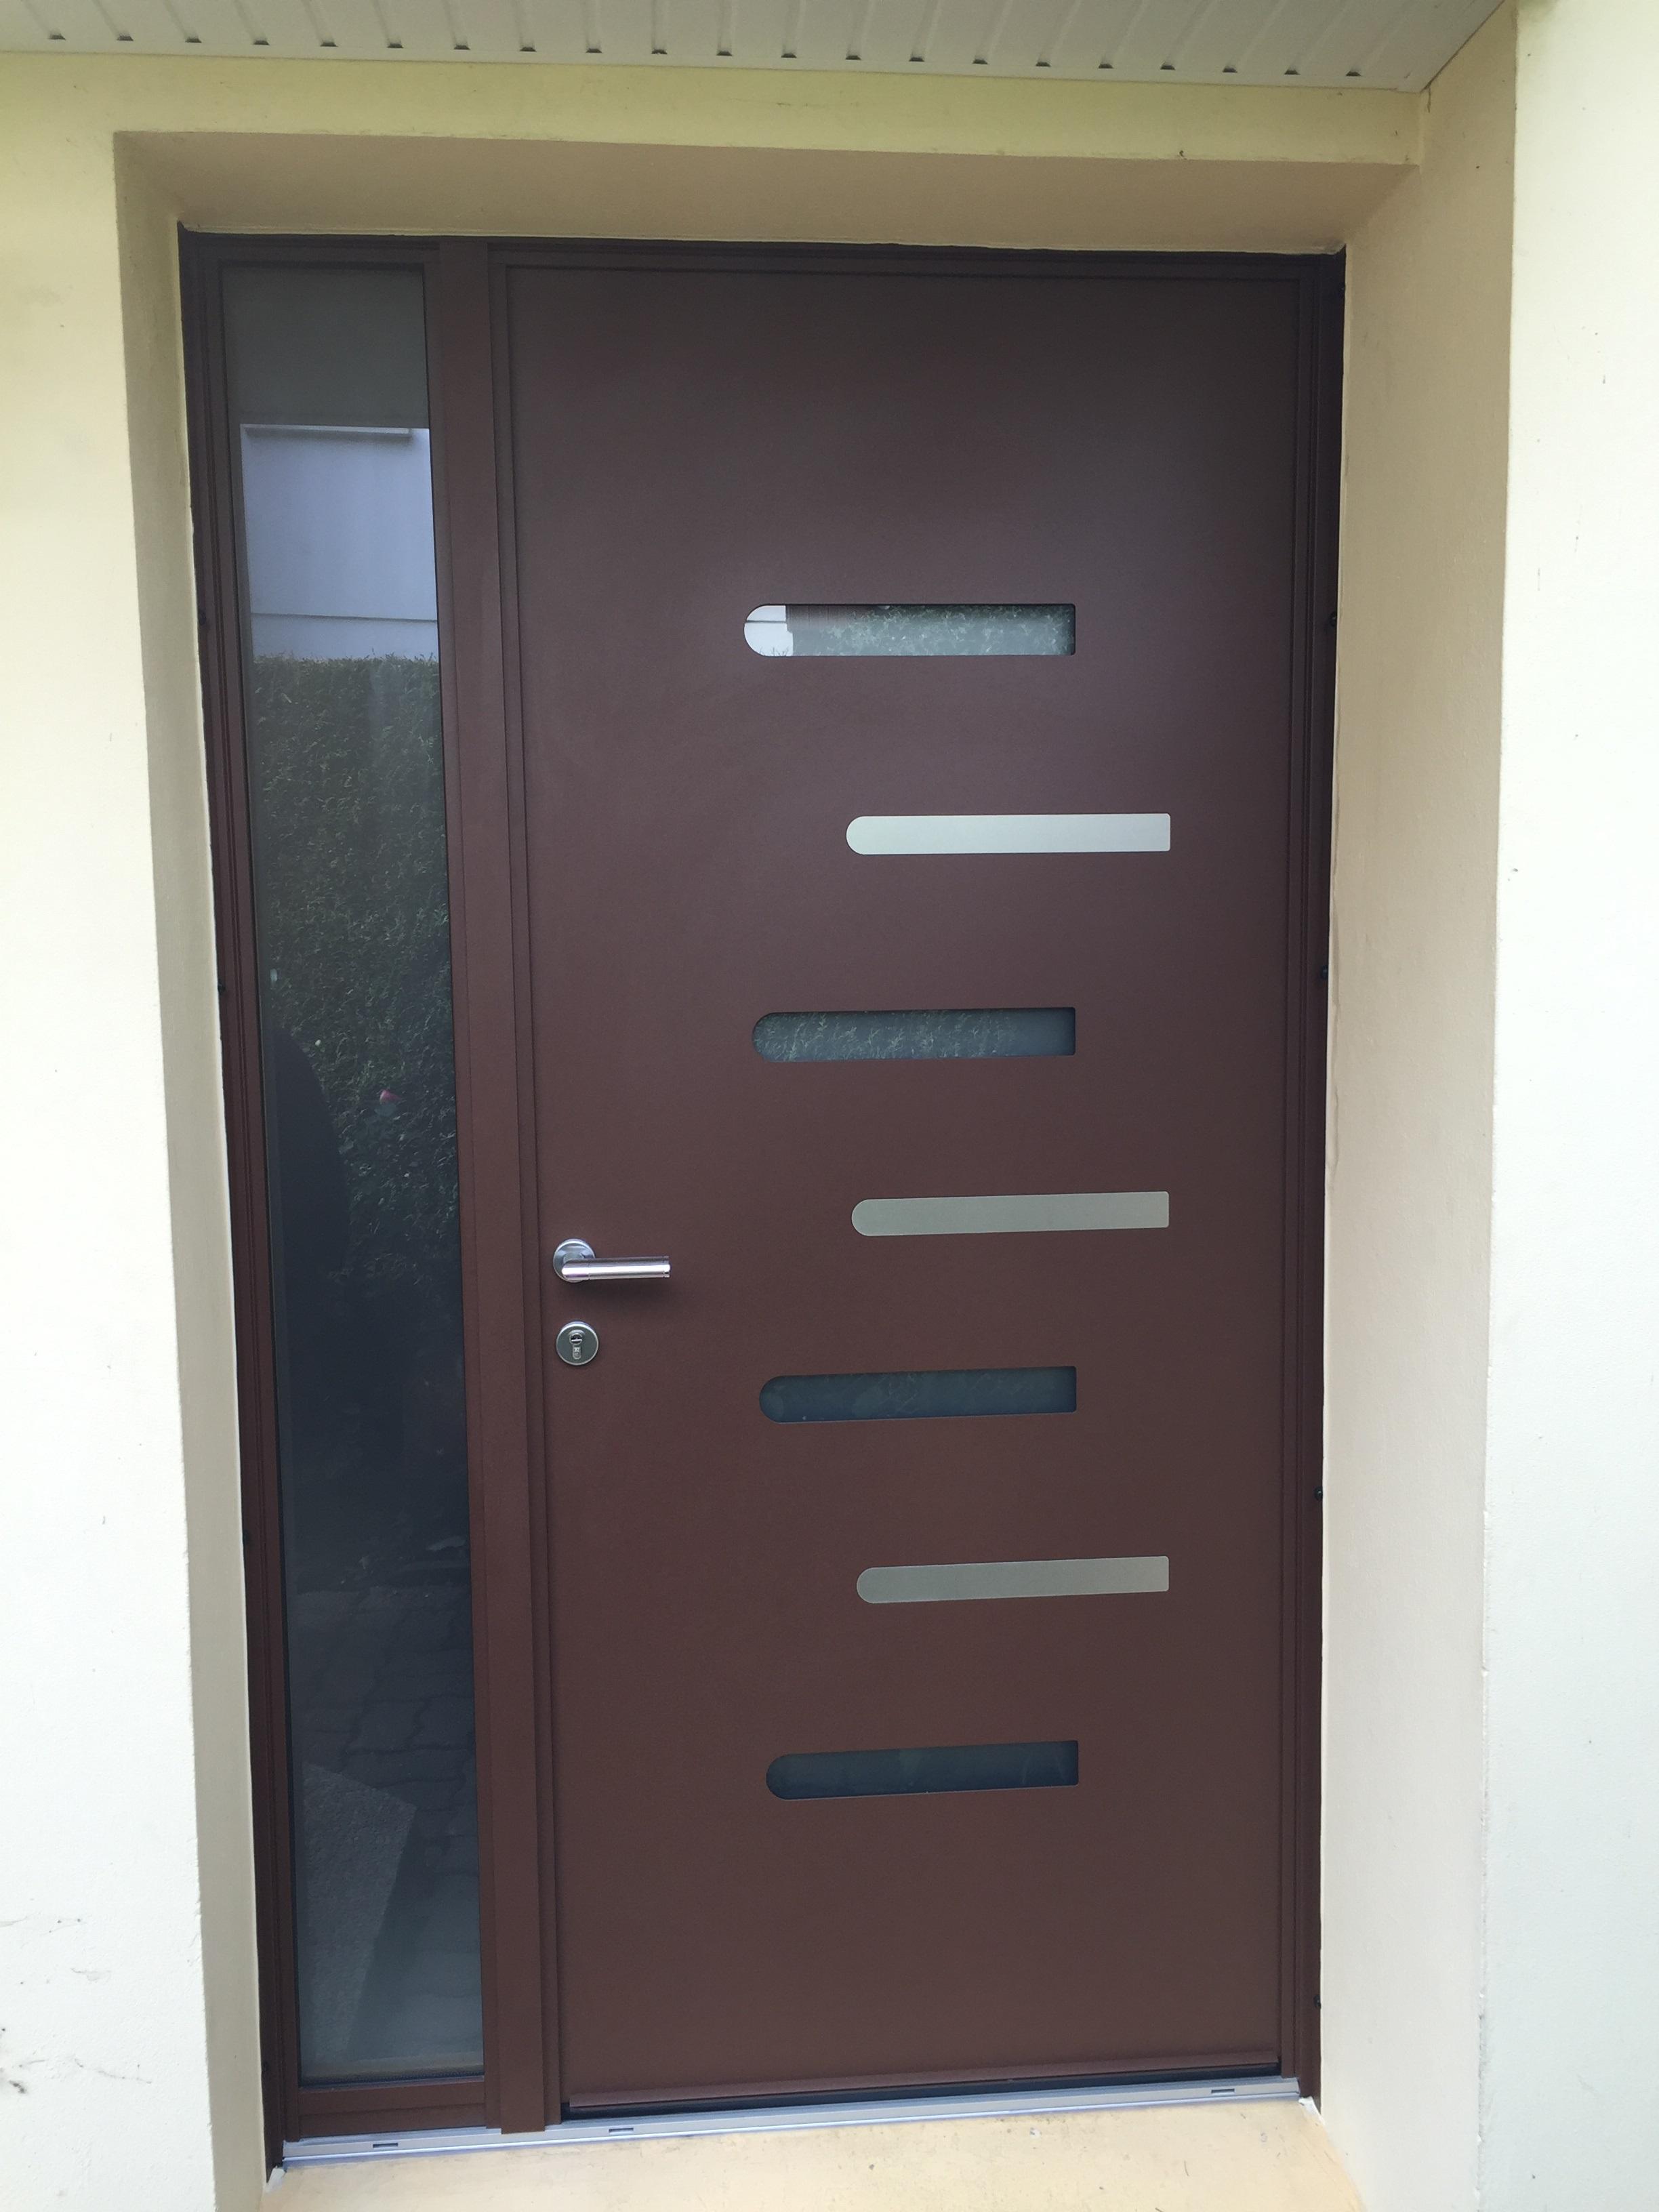 Porte d'entrée en aluminium mixte - Le Mesnil-Esnard